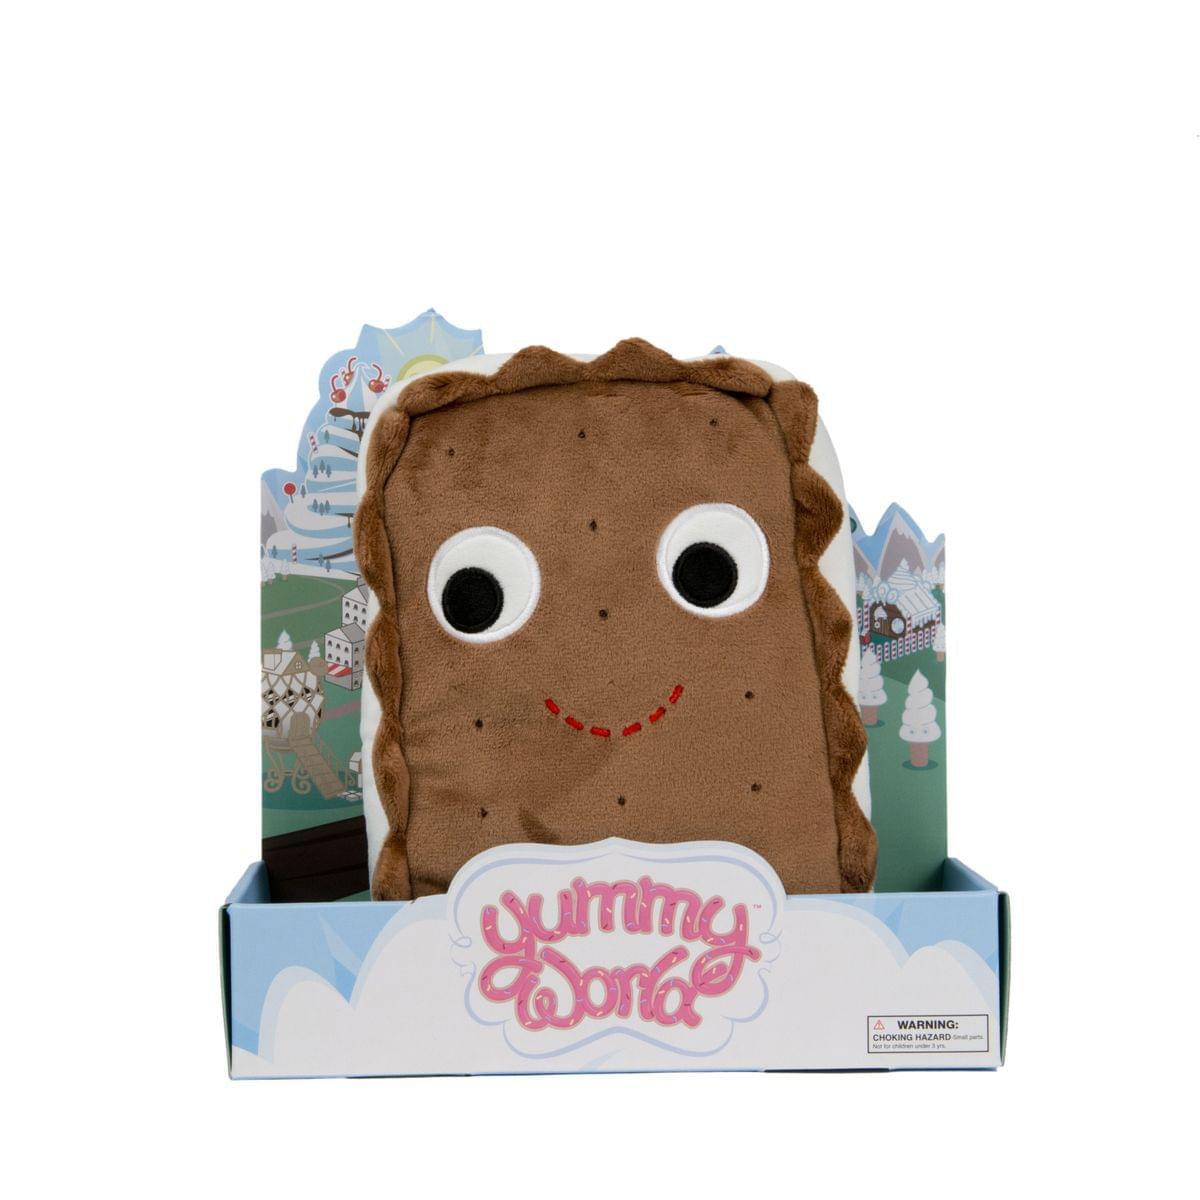 "Yummy World 10"" Designer Plush: Sandy Ice Cream Sandwich - image 1 of 1"